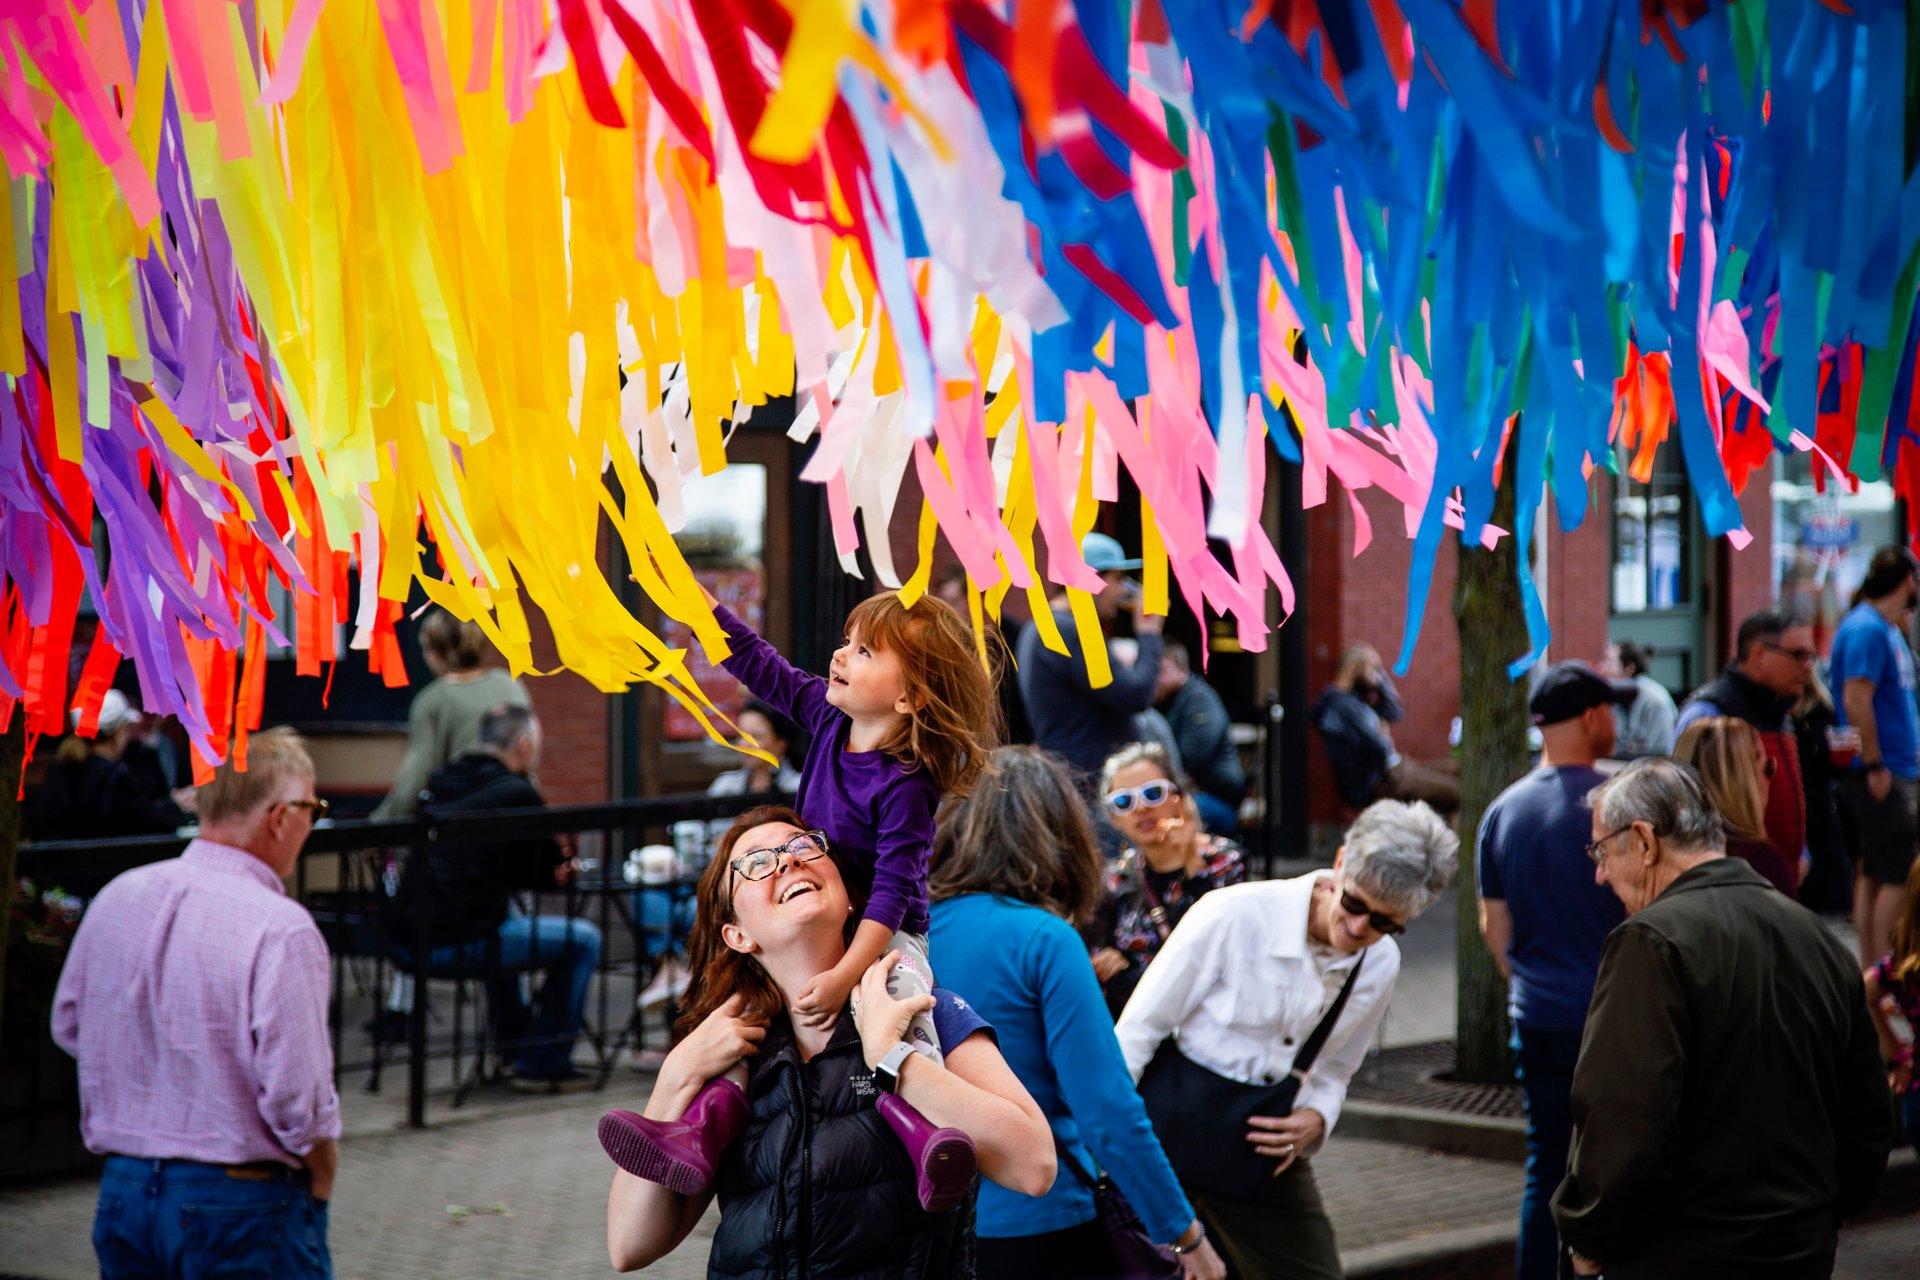 Ohio City Street Festival in Ohio 2020 - Best Time